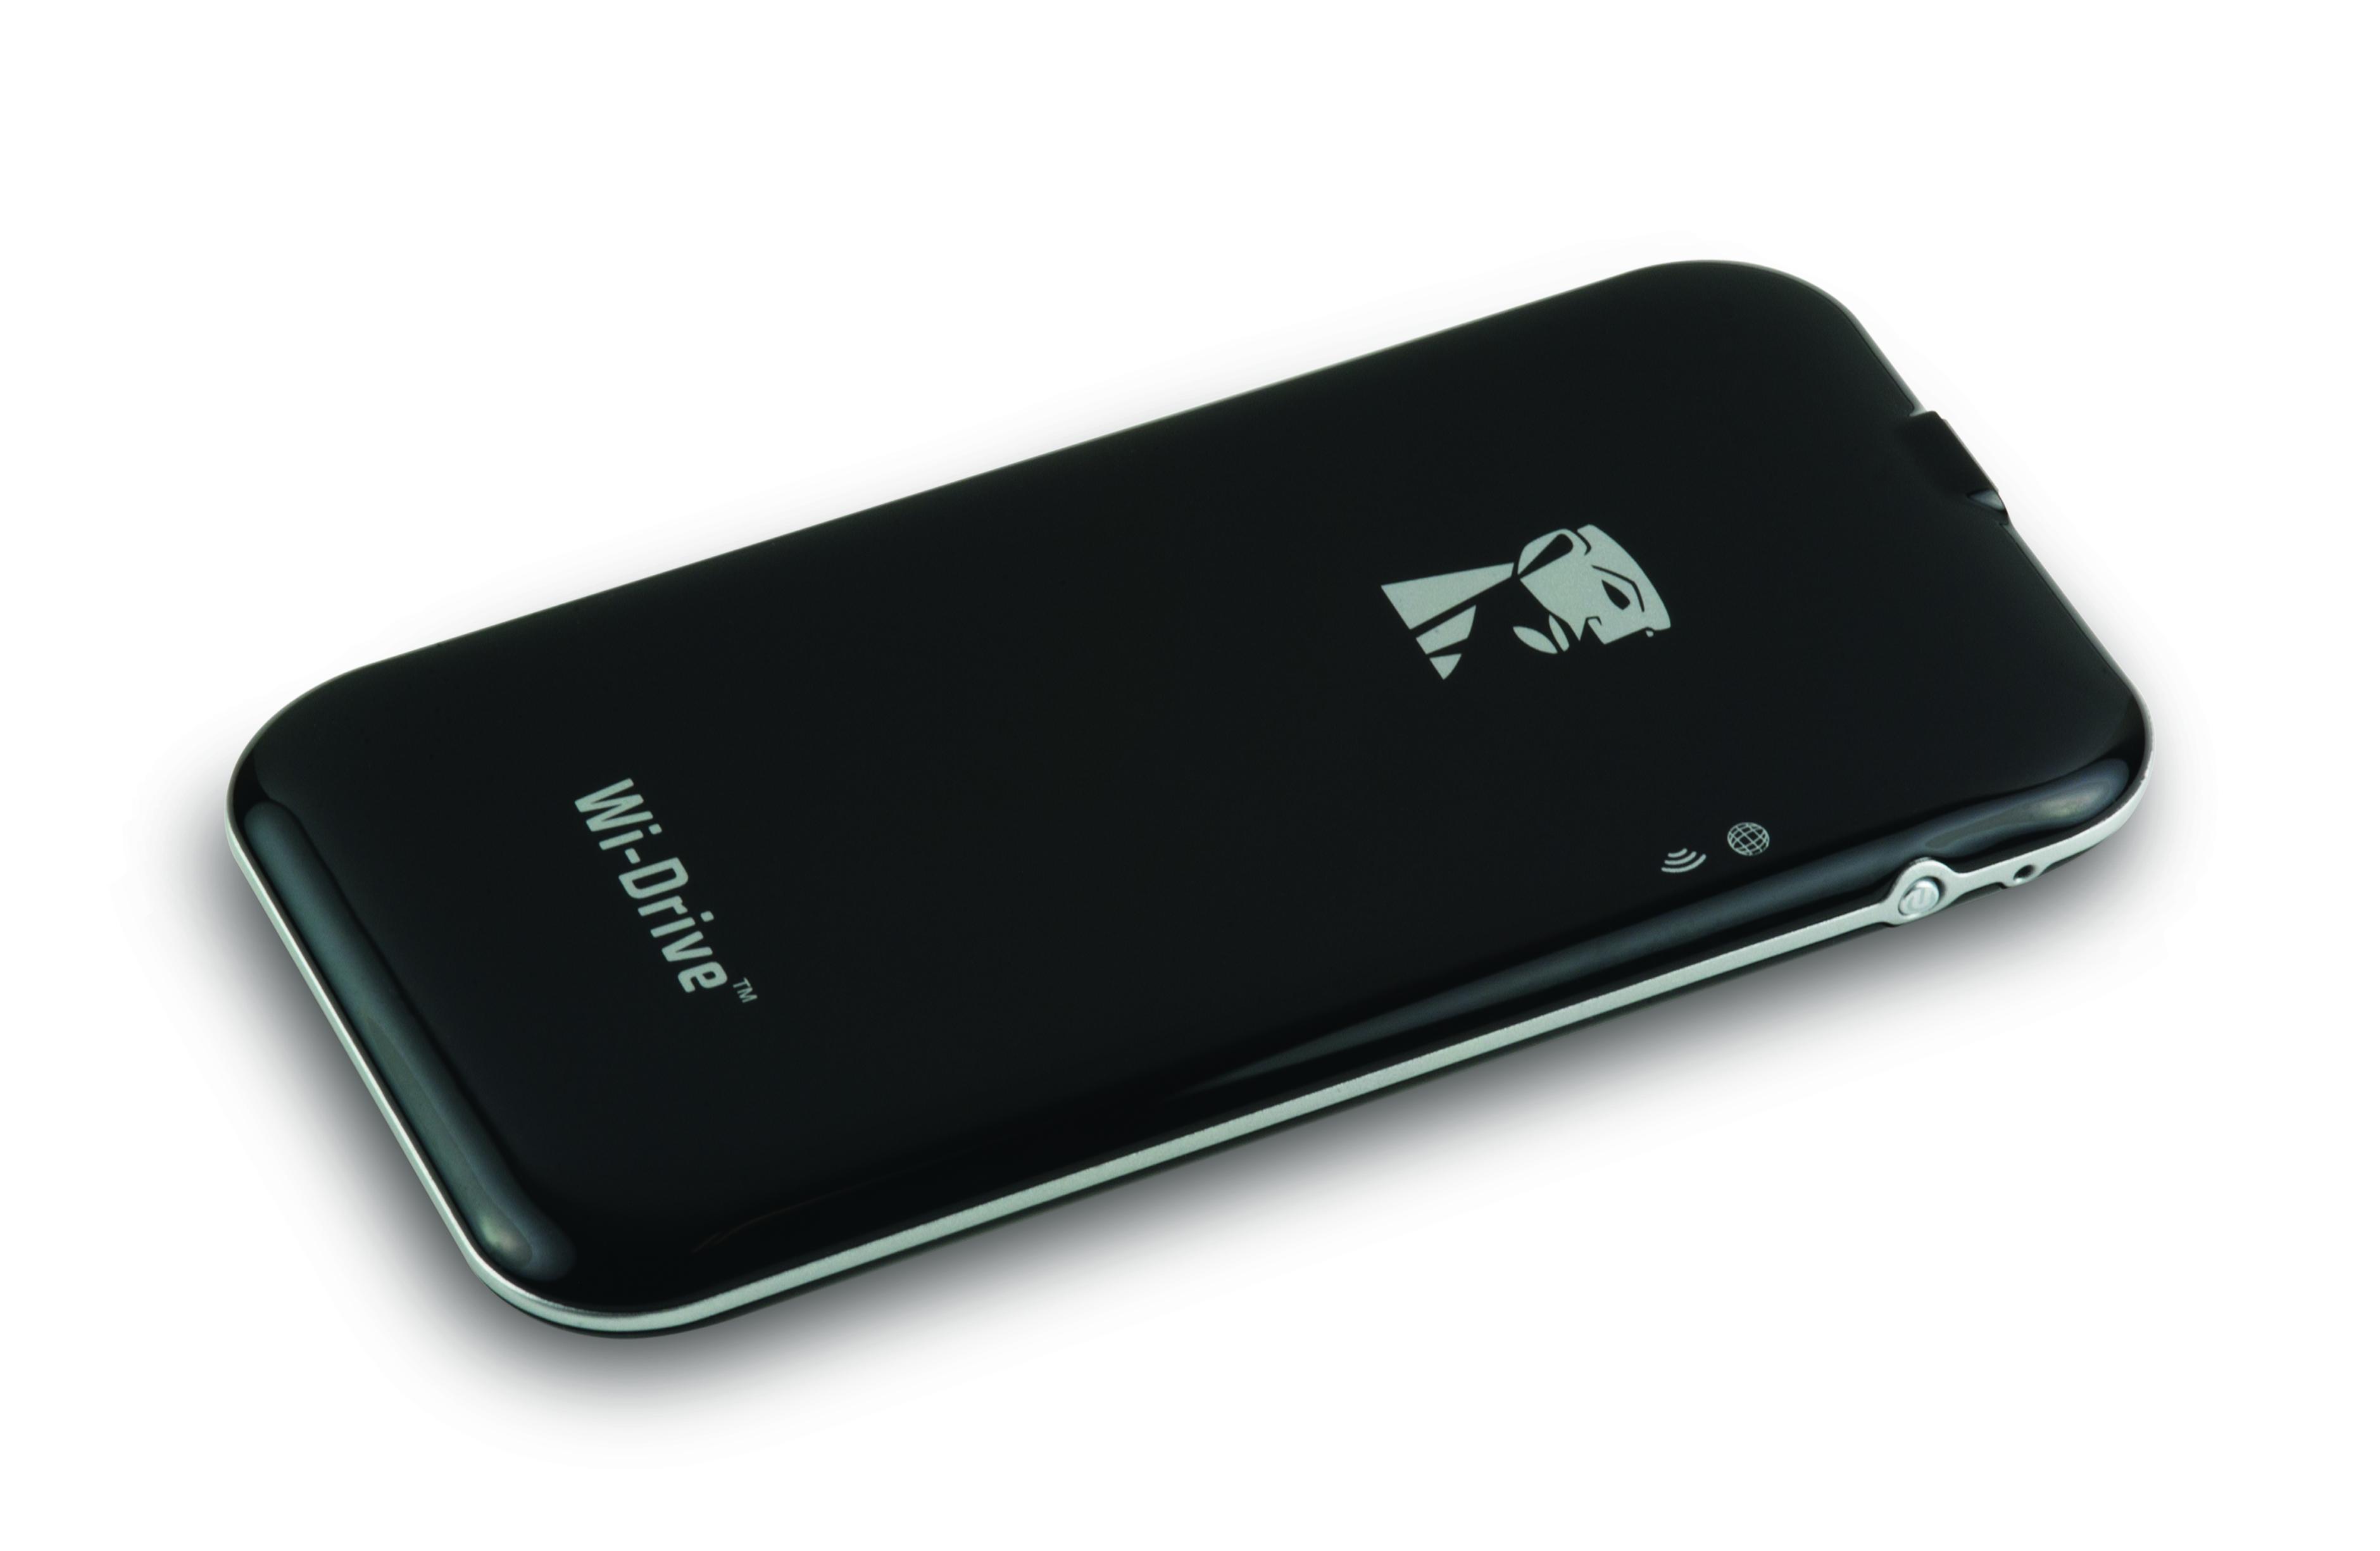 Iphone  Storage Expansion